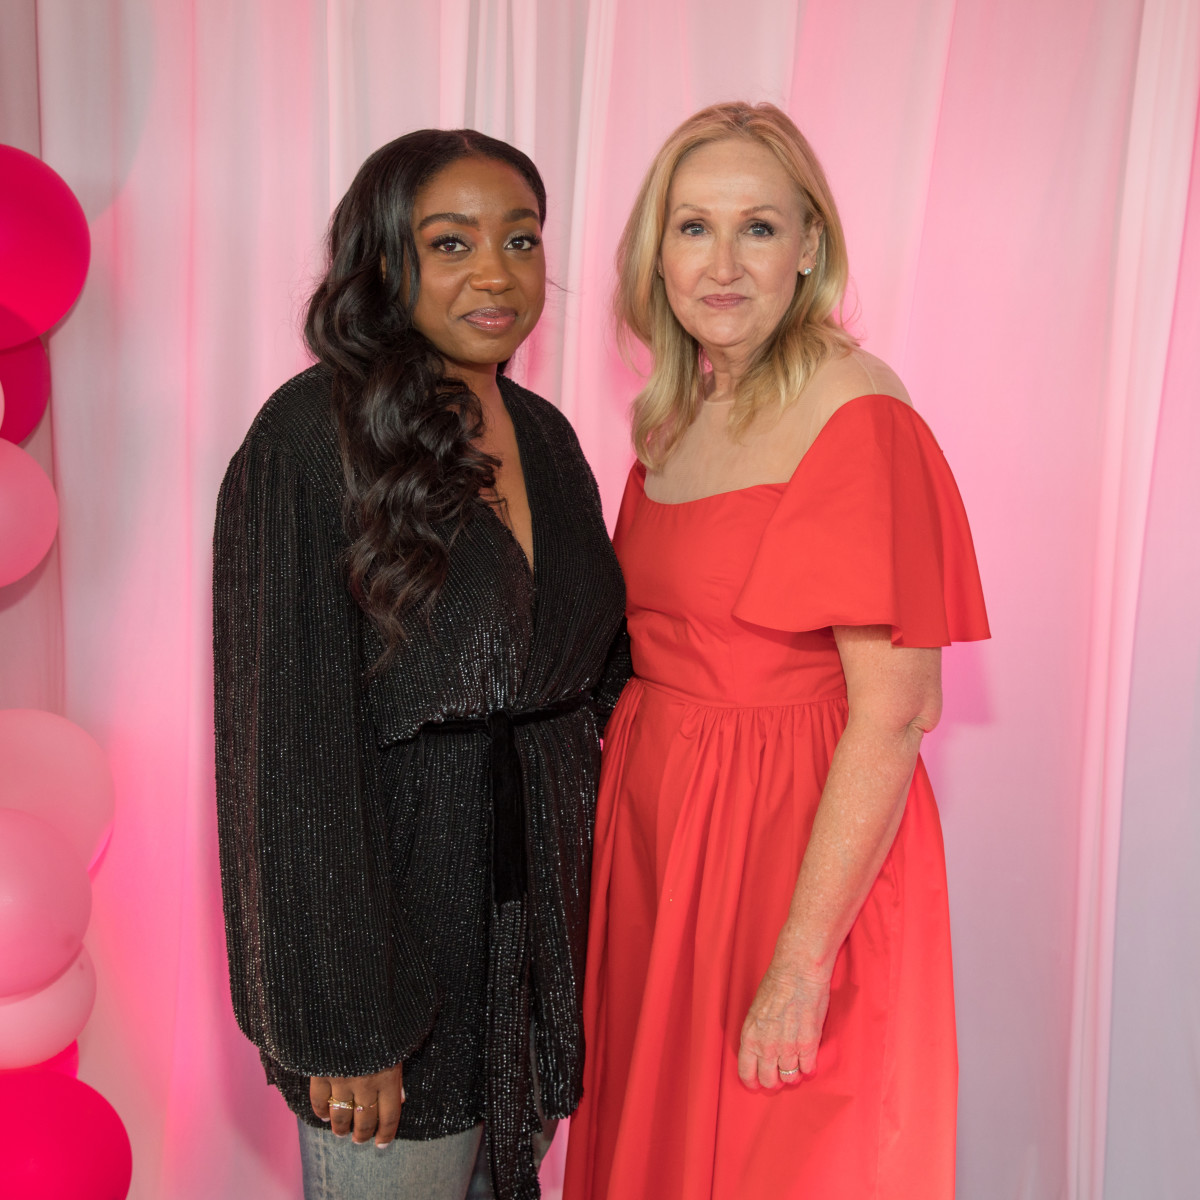 Teen Vogue's Sweet 16 Lindsay Peoples Wagner Sally Morrison